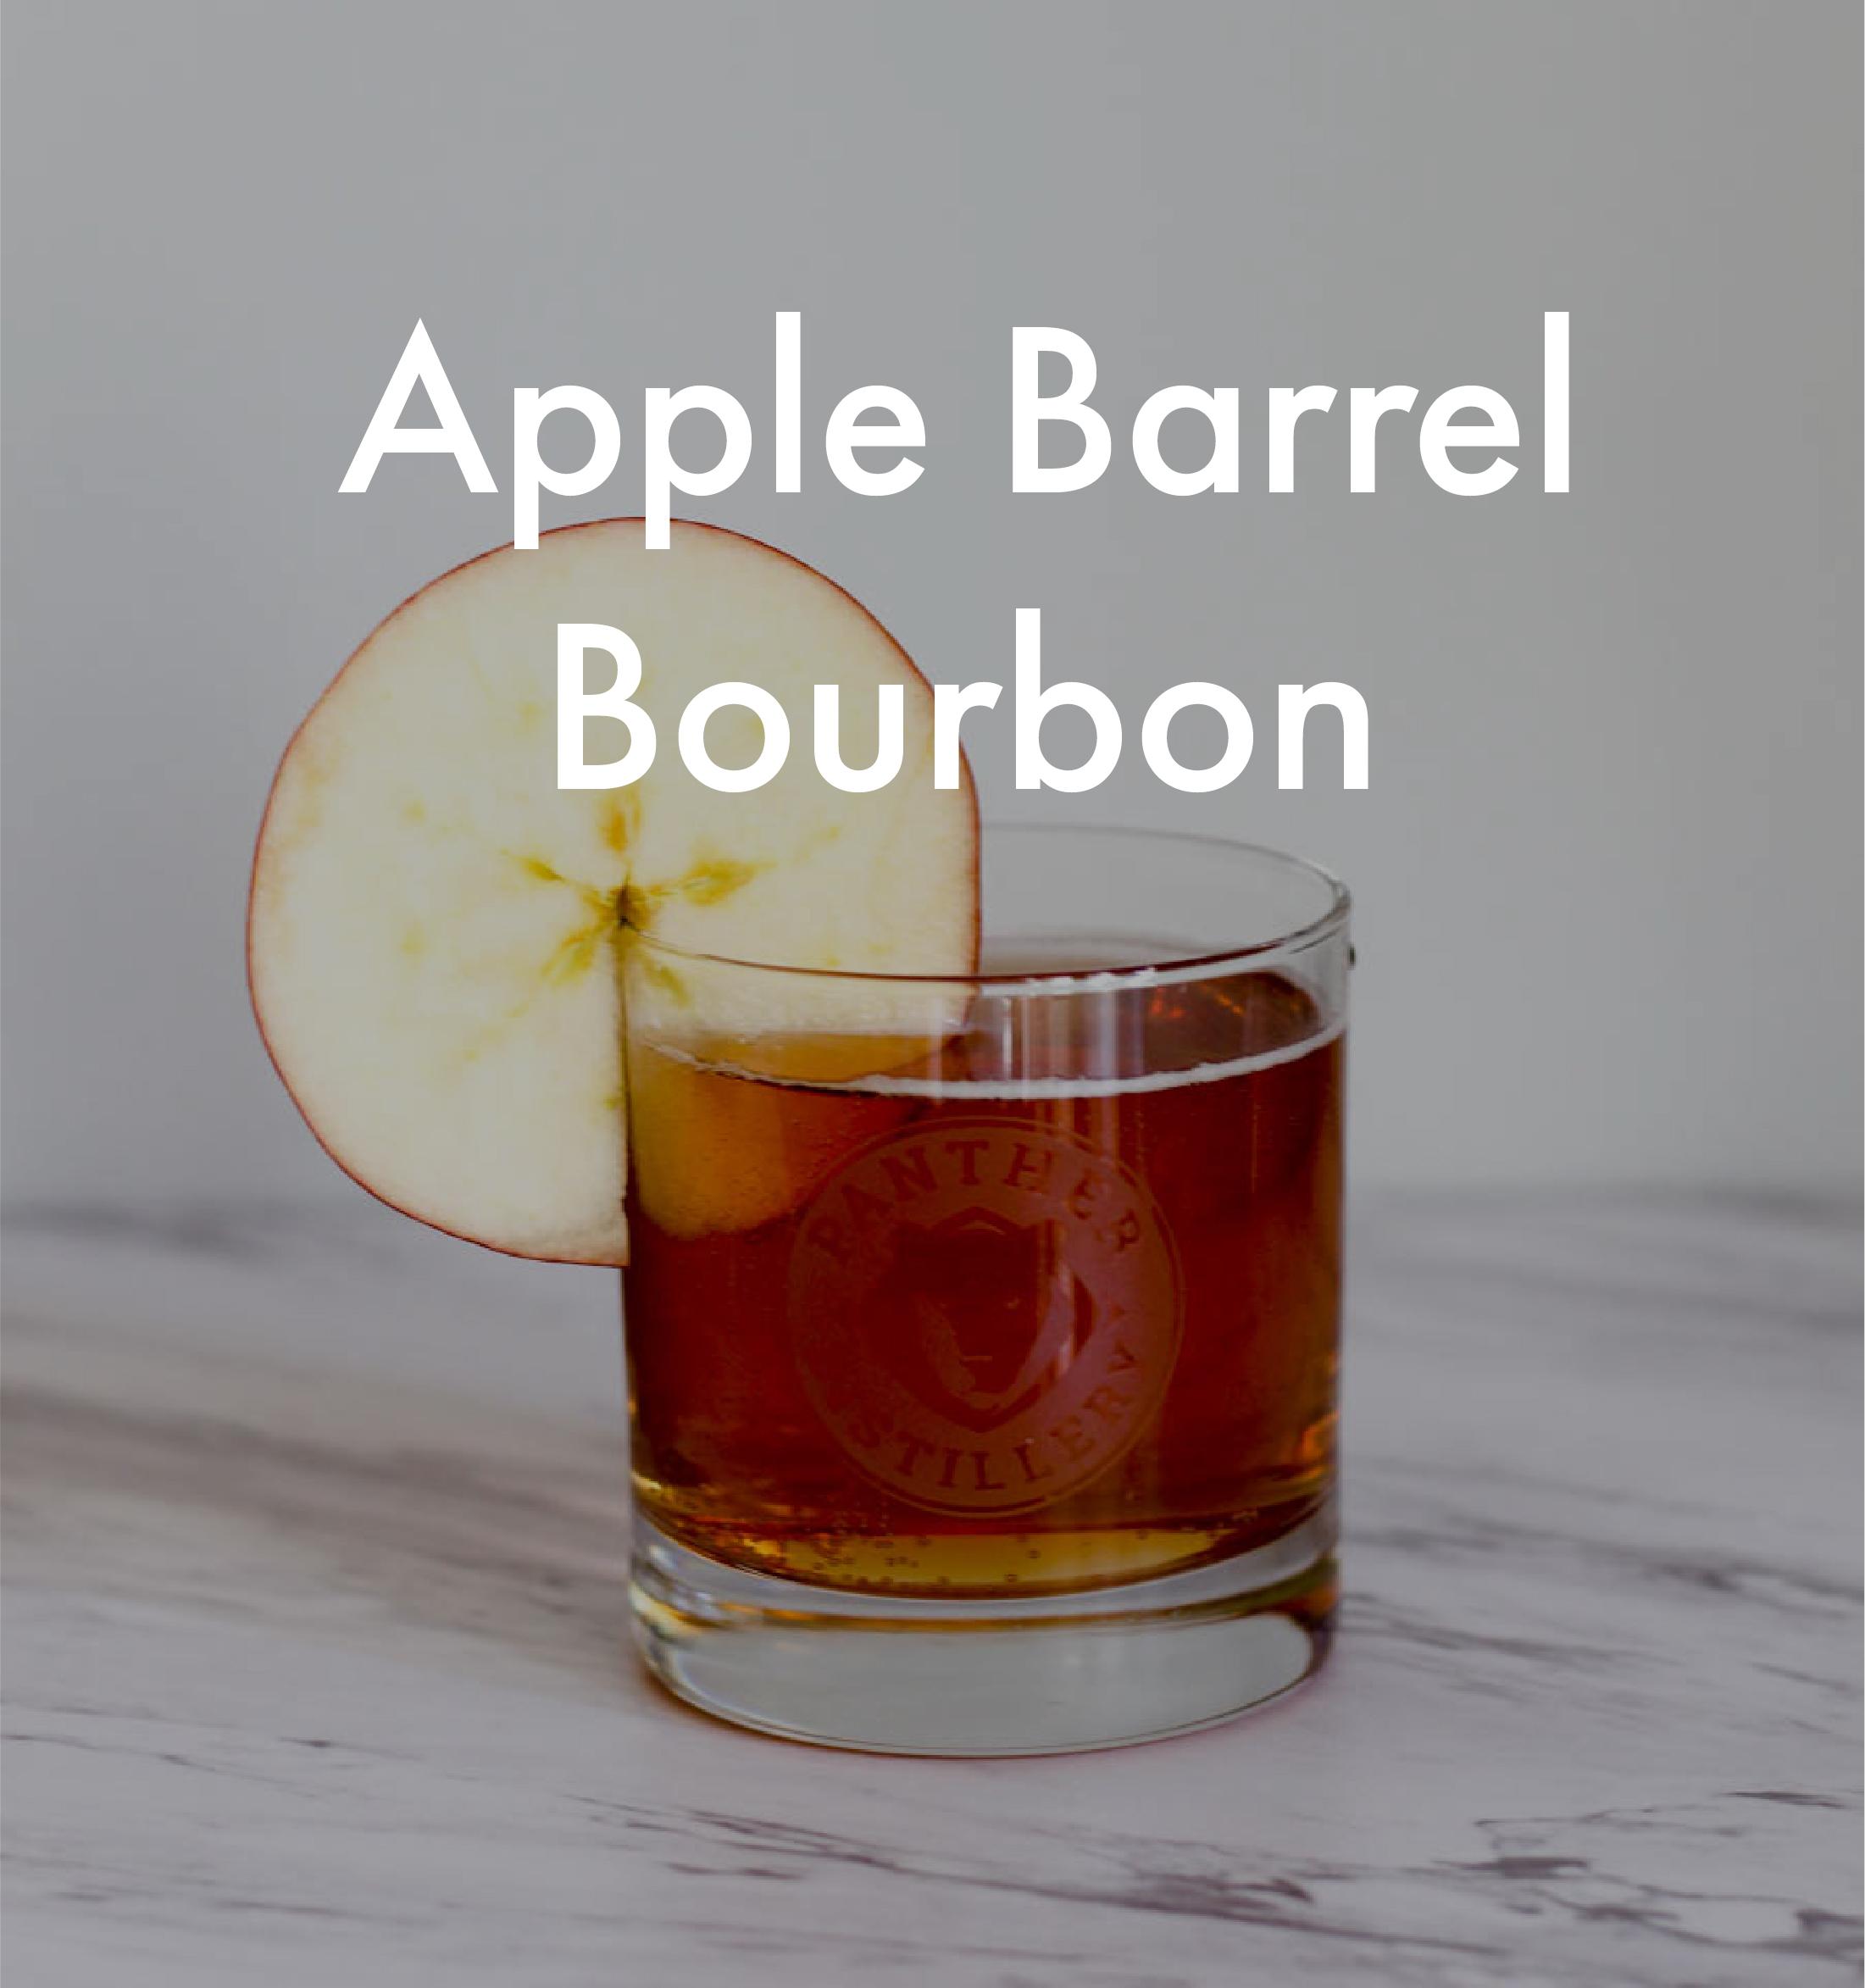 Apple Barrel Bourbon Cocktail